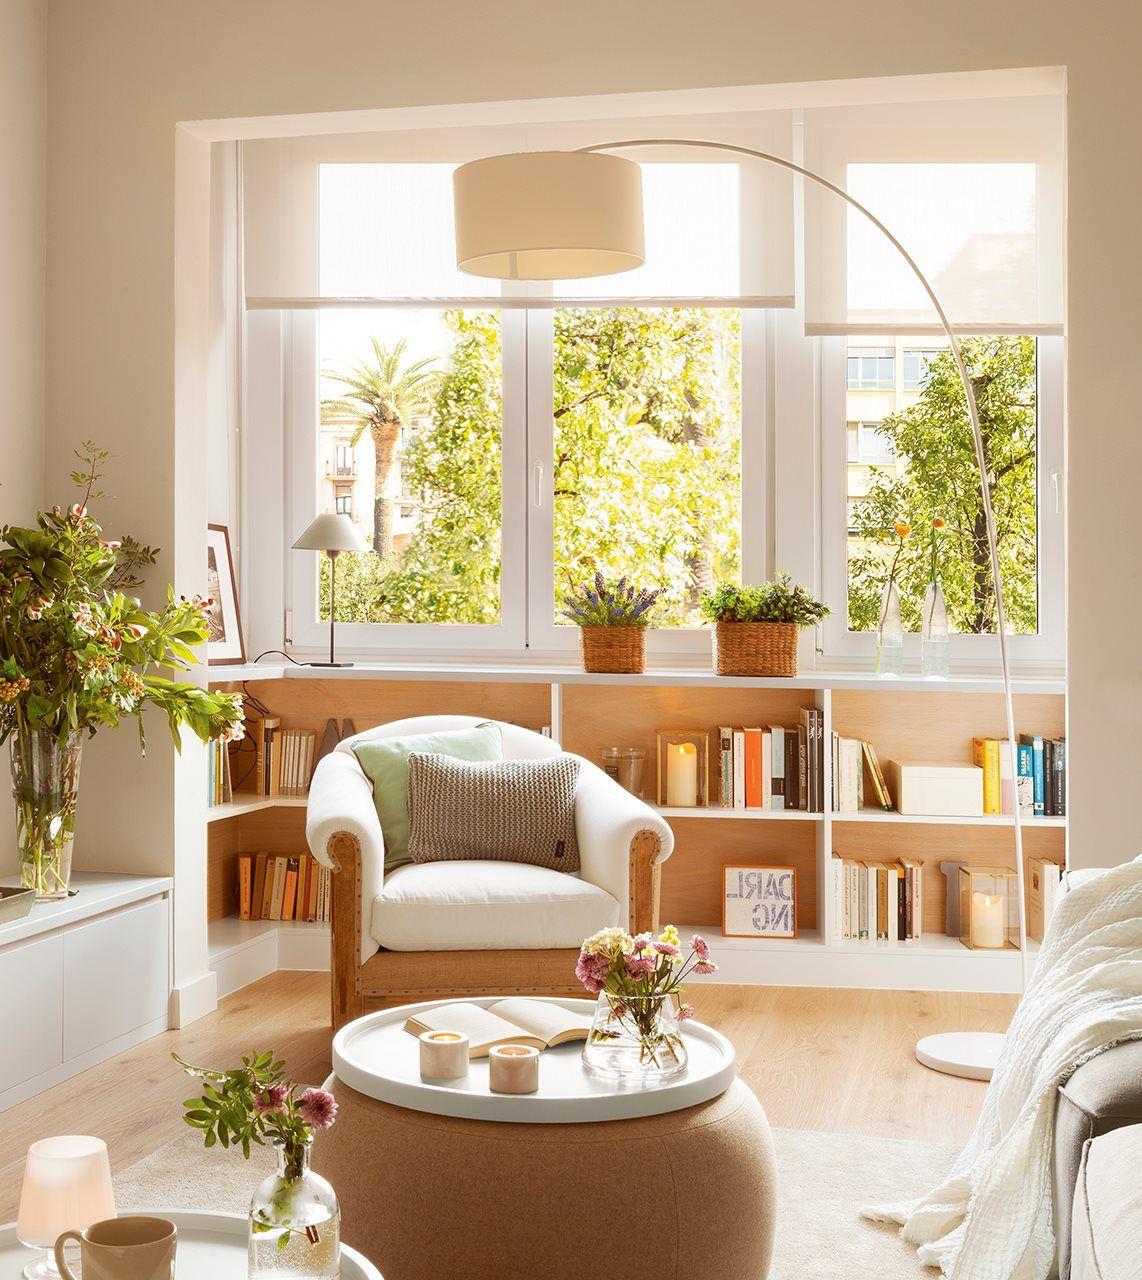 Decora bien 15 errores que debes evitar ideas para for Escuela de decoracion de interiores